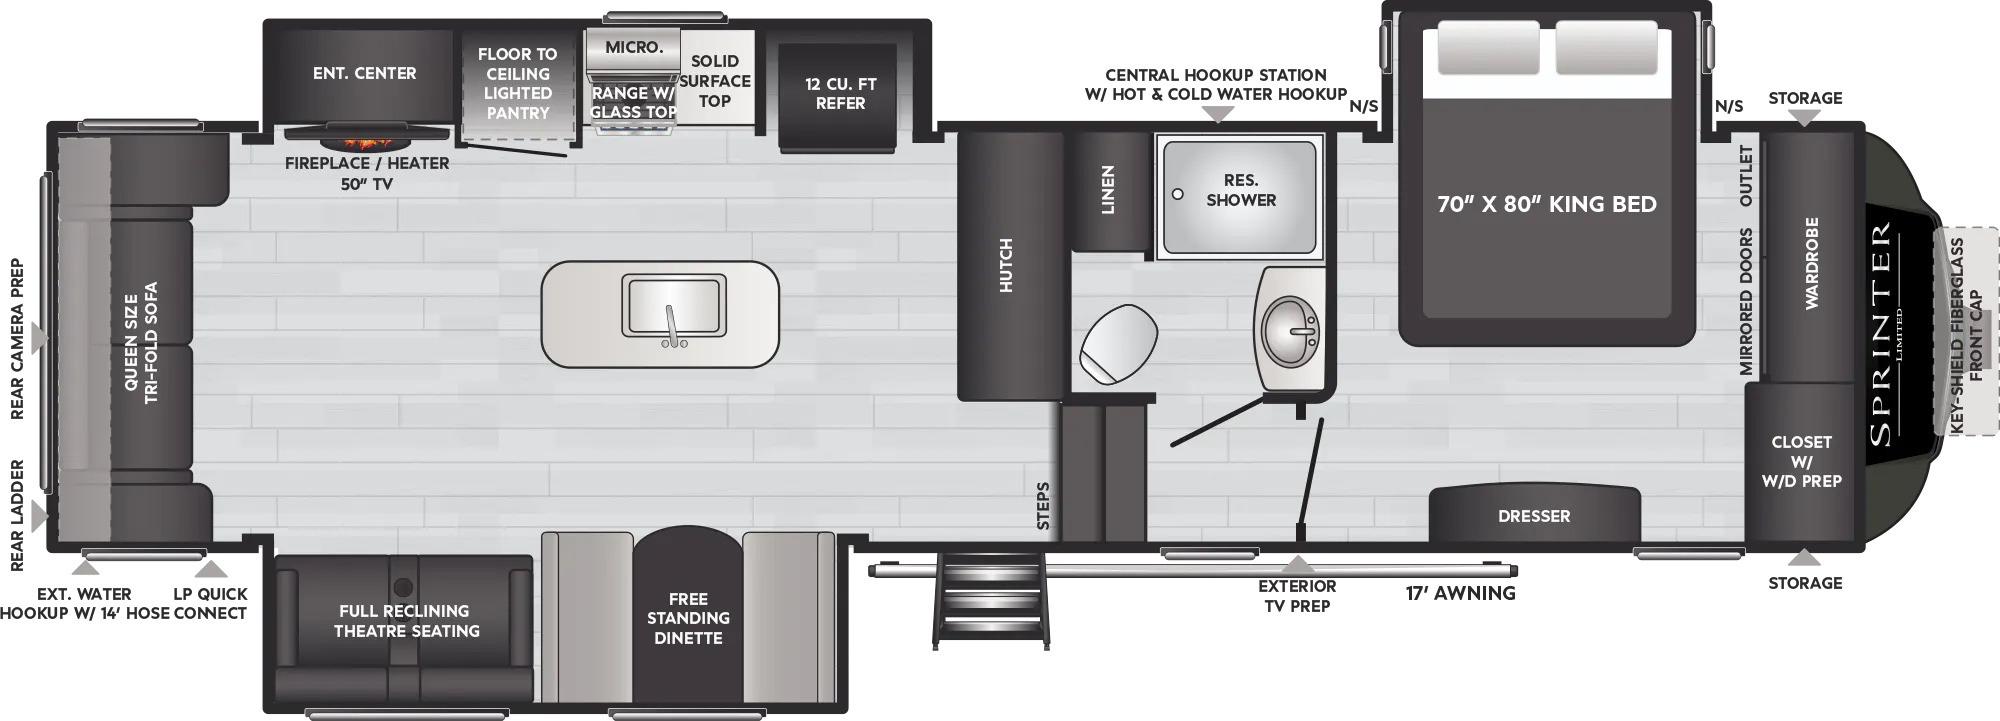 View Floor Plan for 2022 KEYSTONE SPRINTER LIMITED 3190RLS